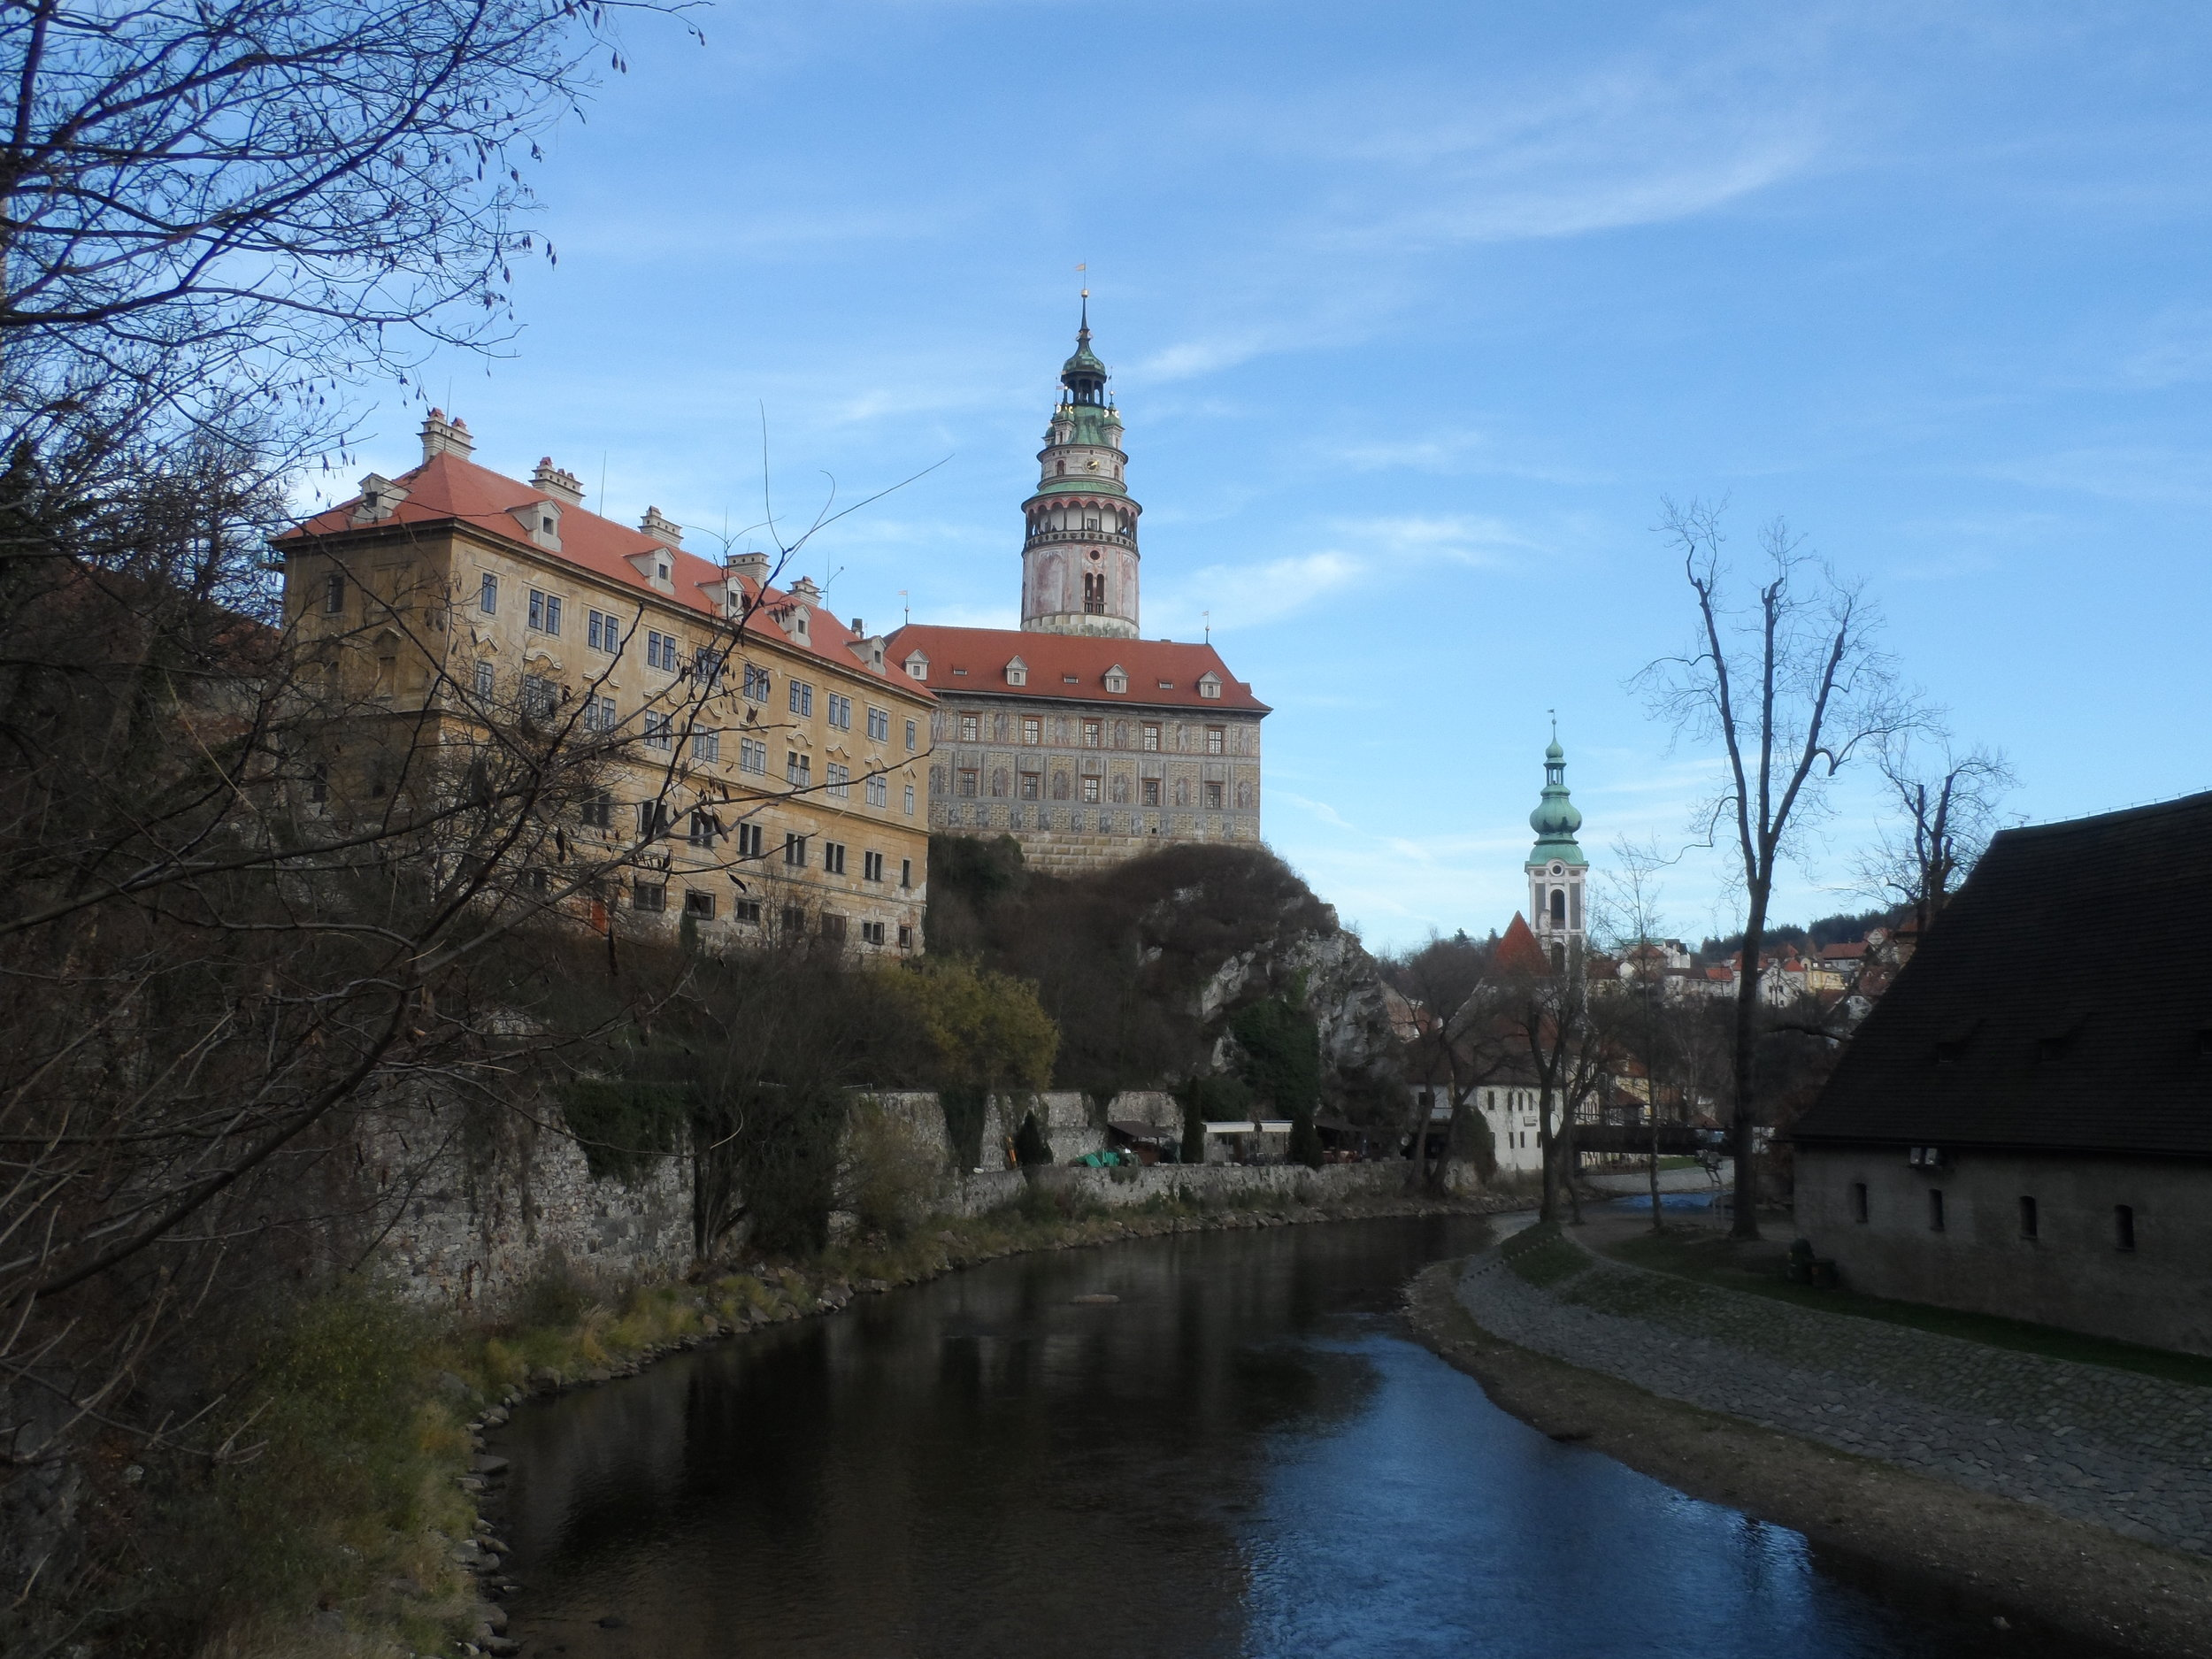 Cesky Krummlov, Czech Republic